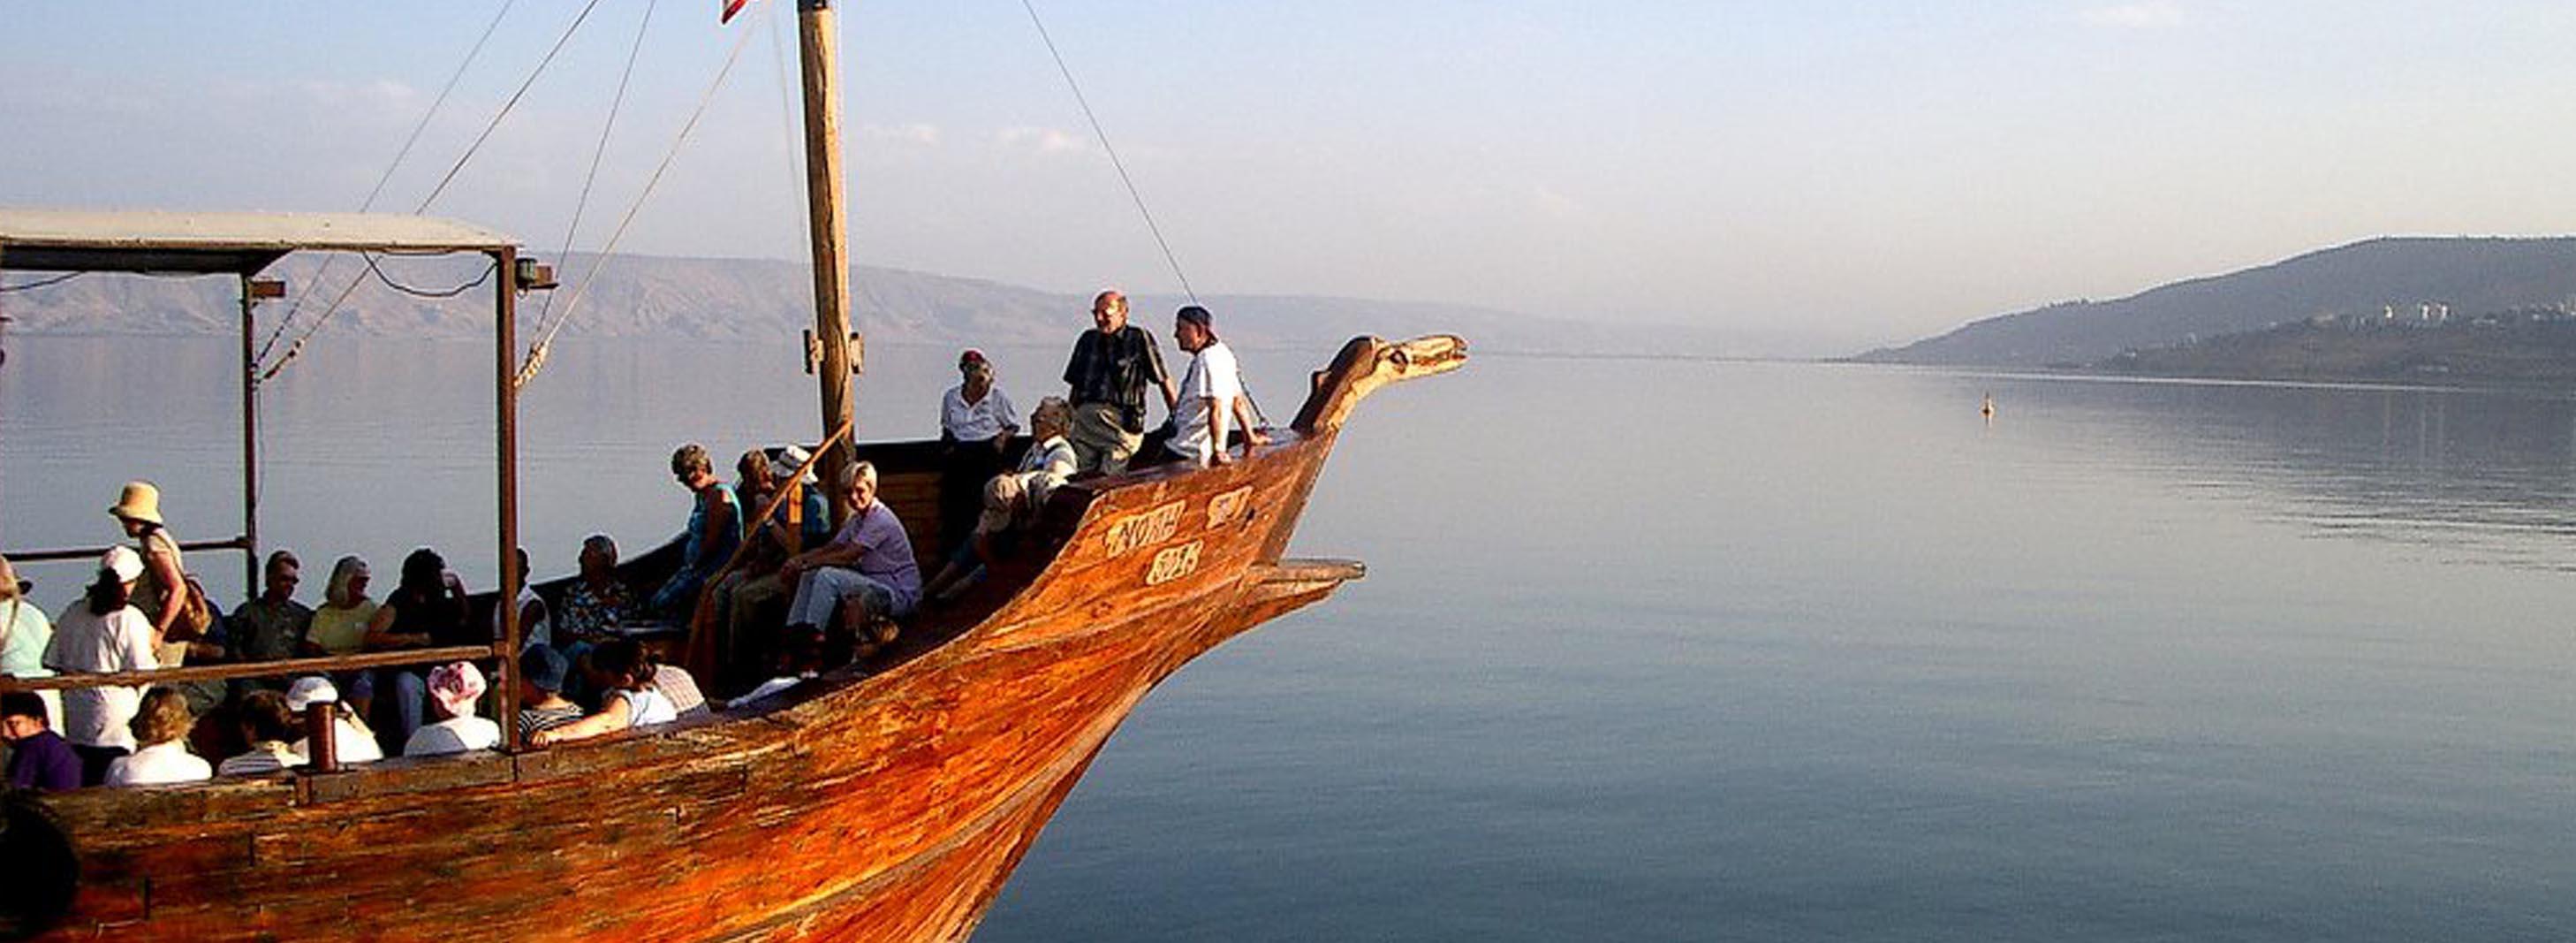 boat galile